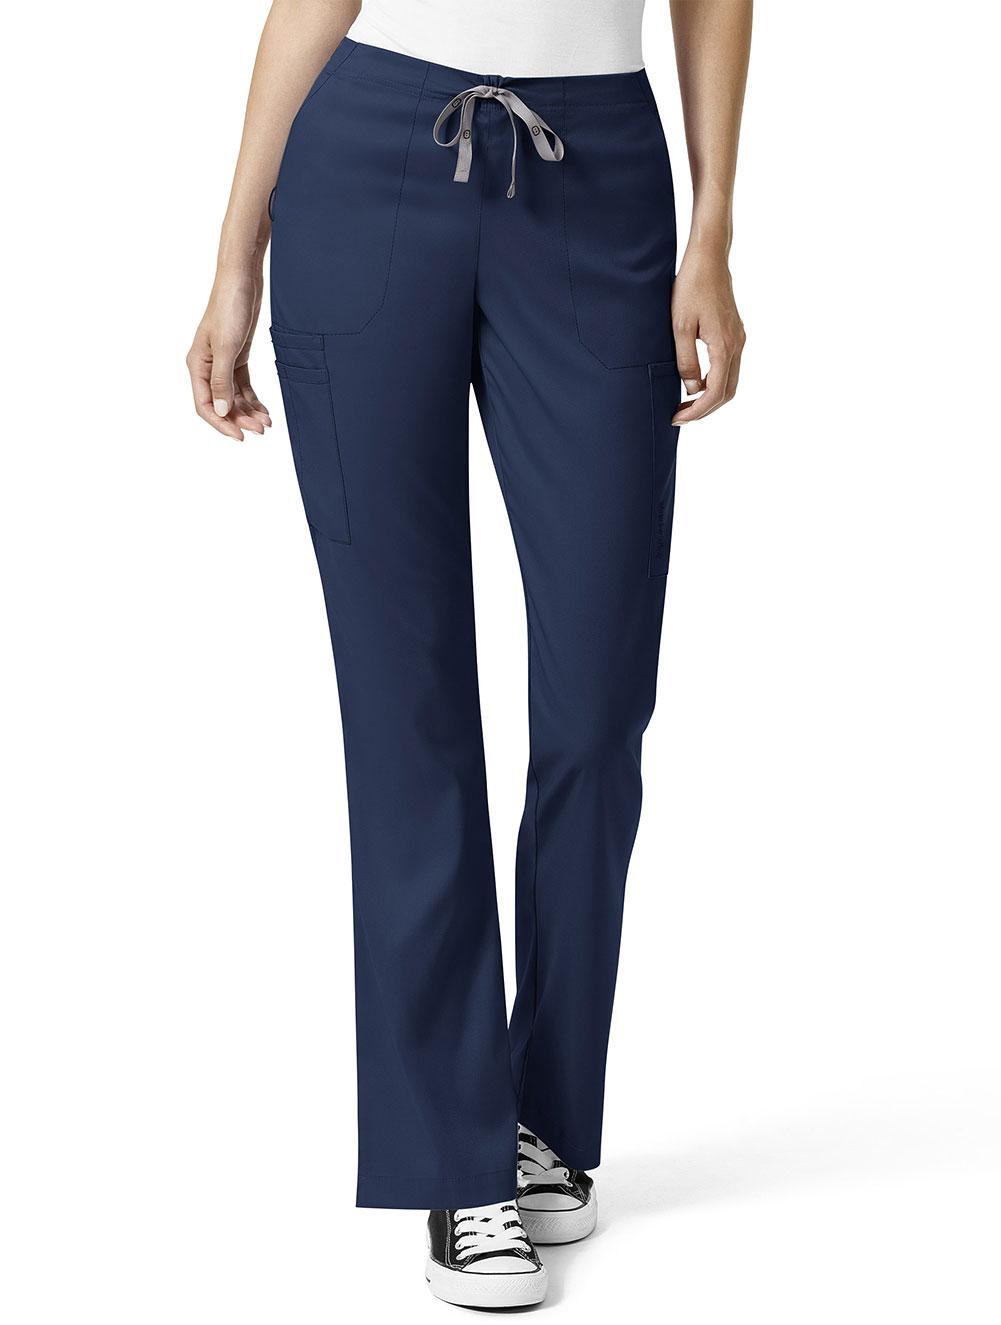 Women's Moderate Flare Leg Cargo Pant